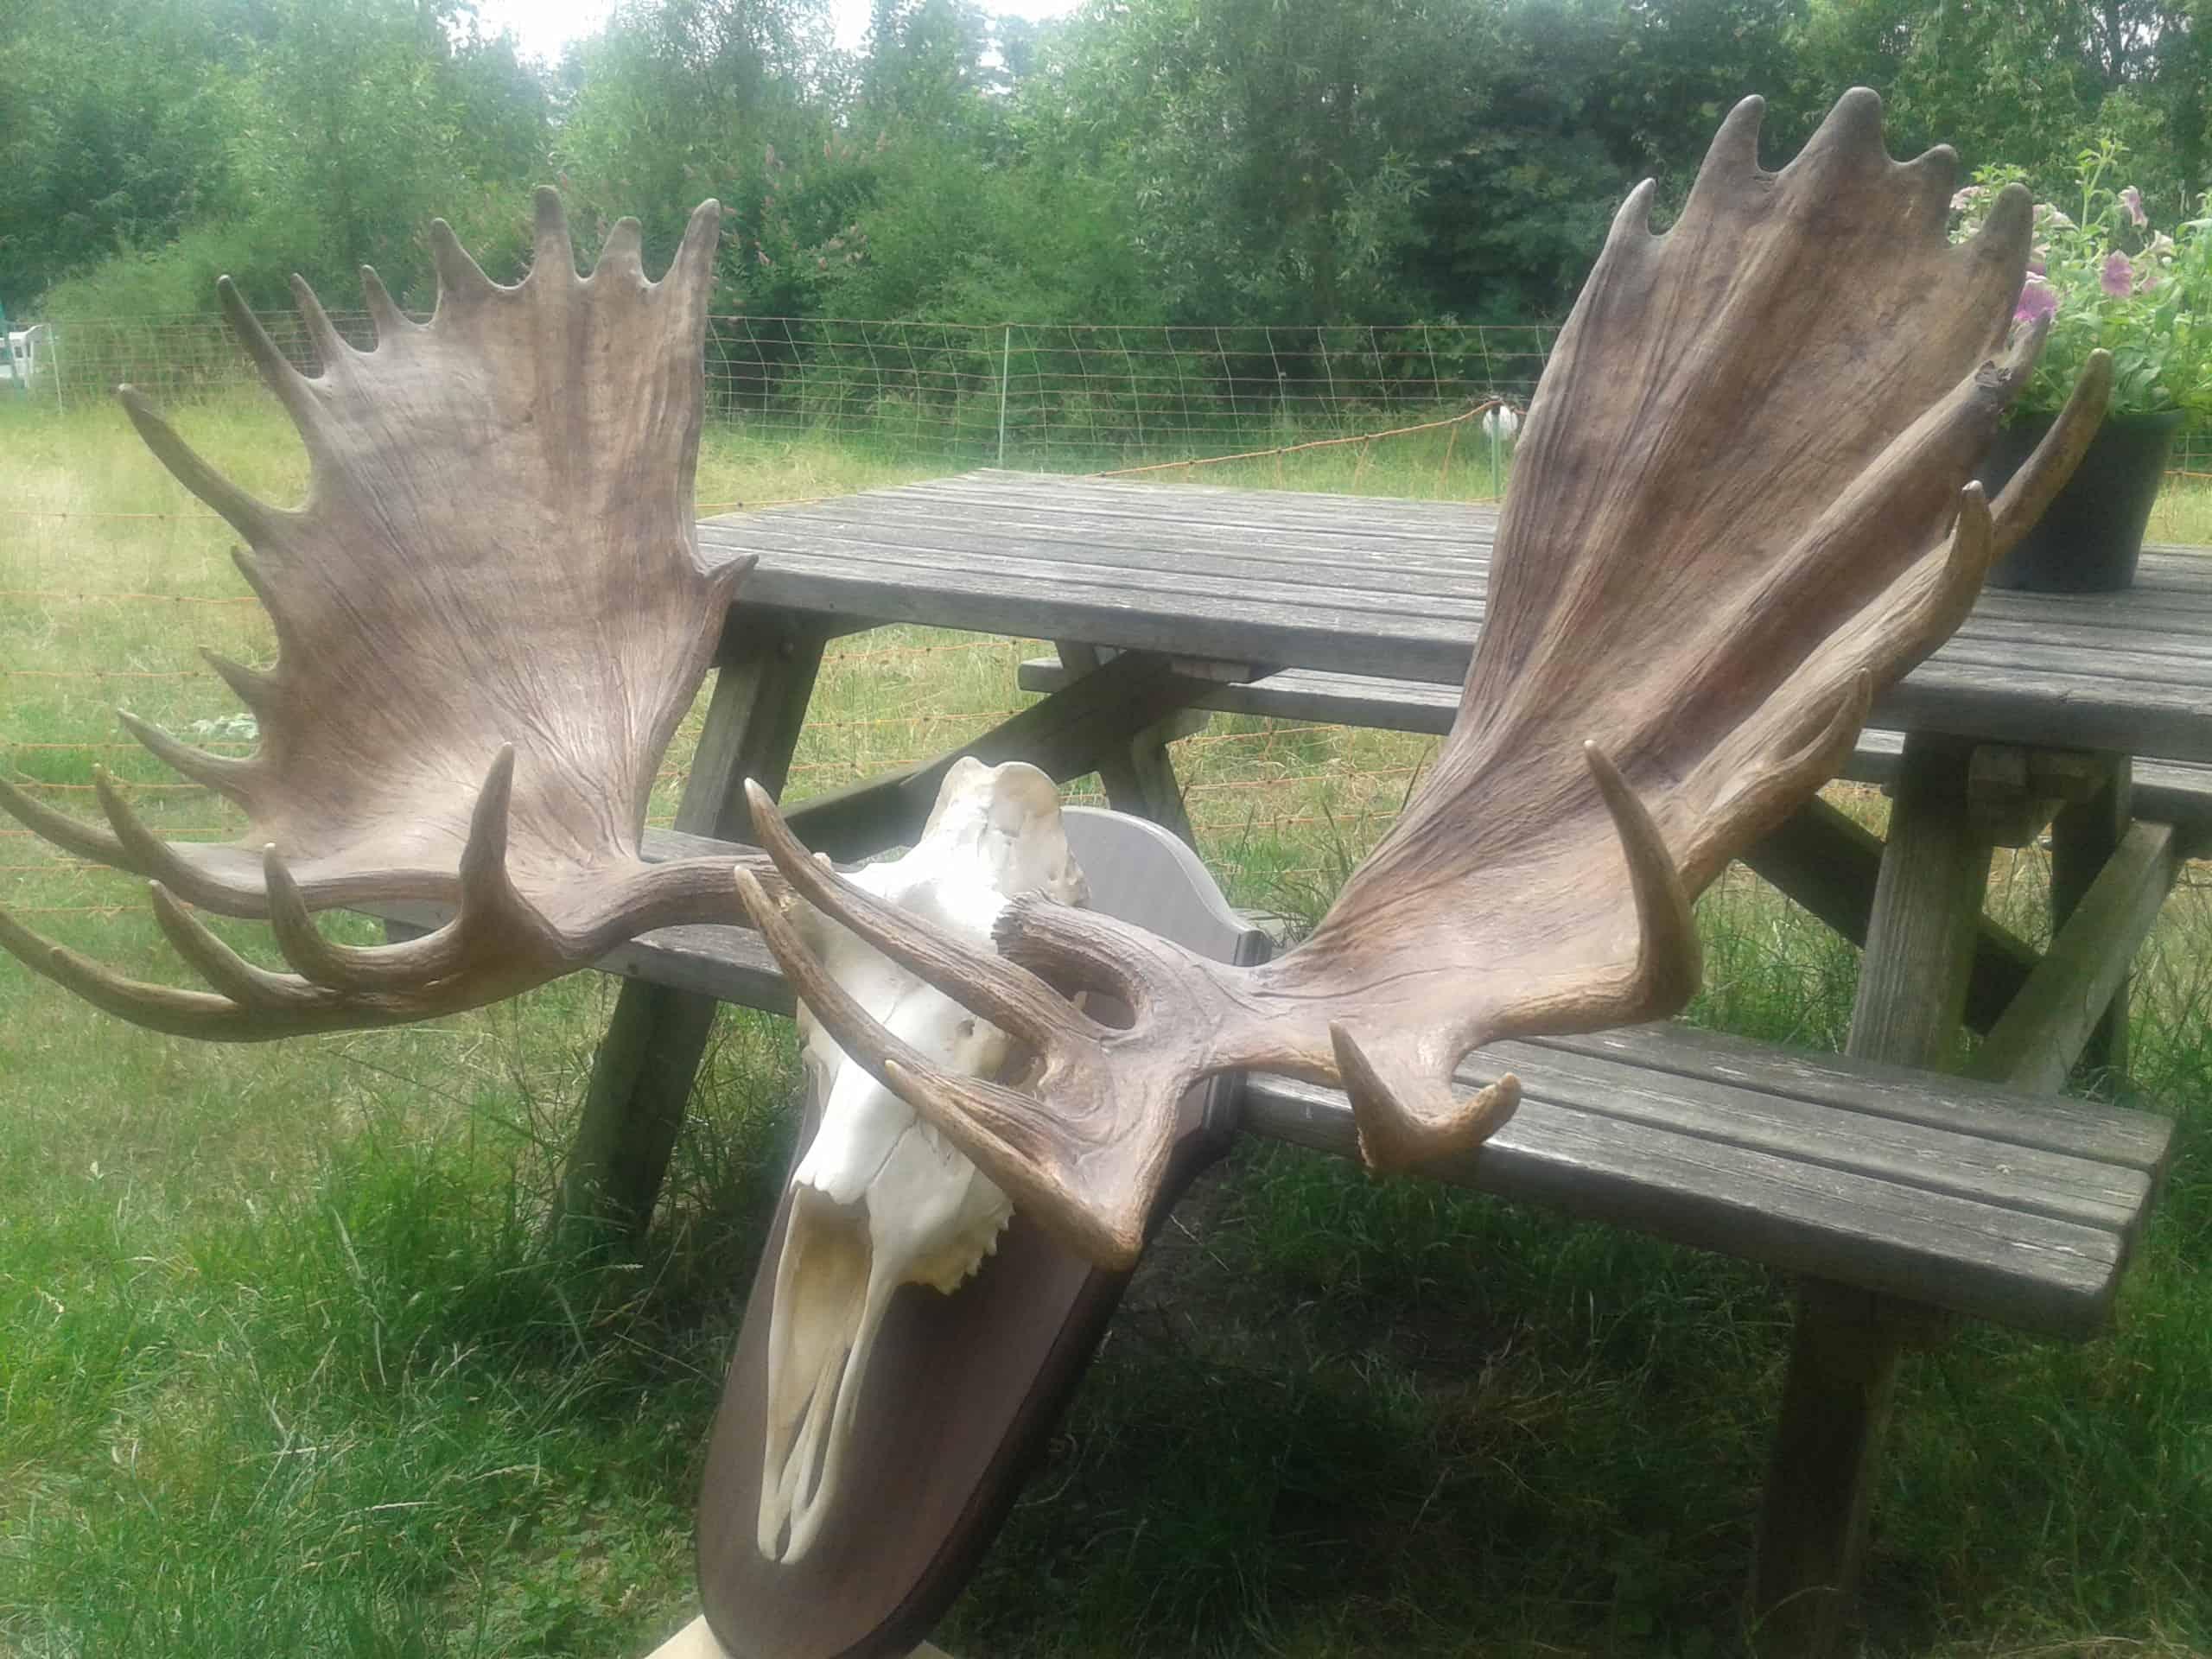 Skelette | Kamtschatka-Elch | Präparation von Jagdtrophäen